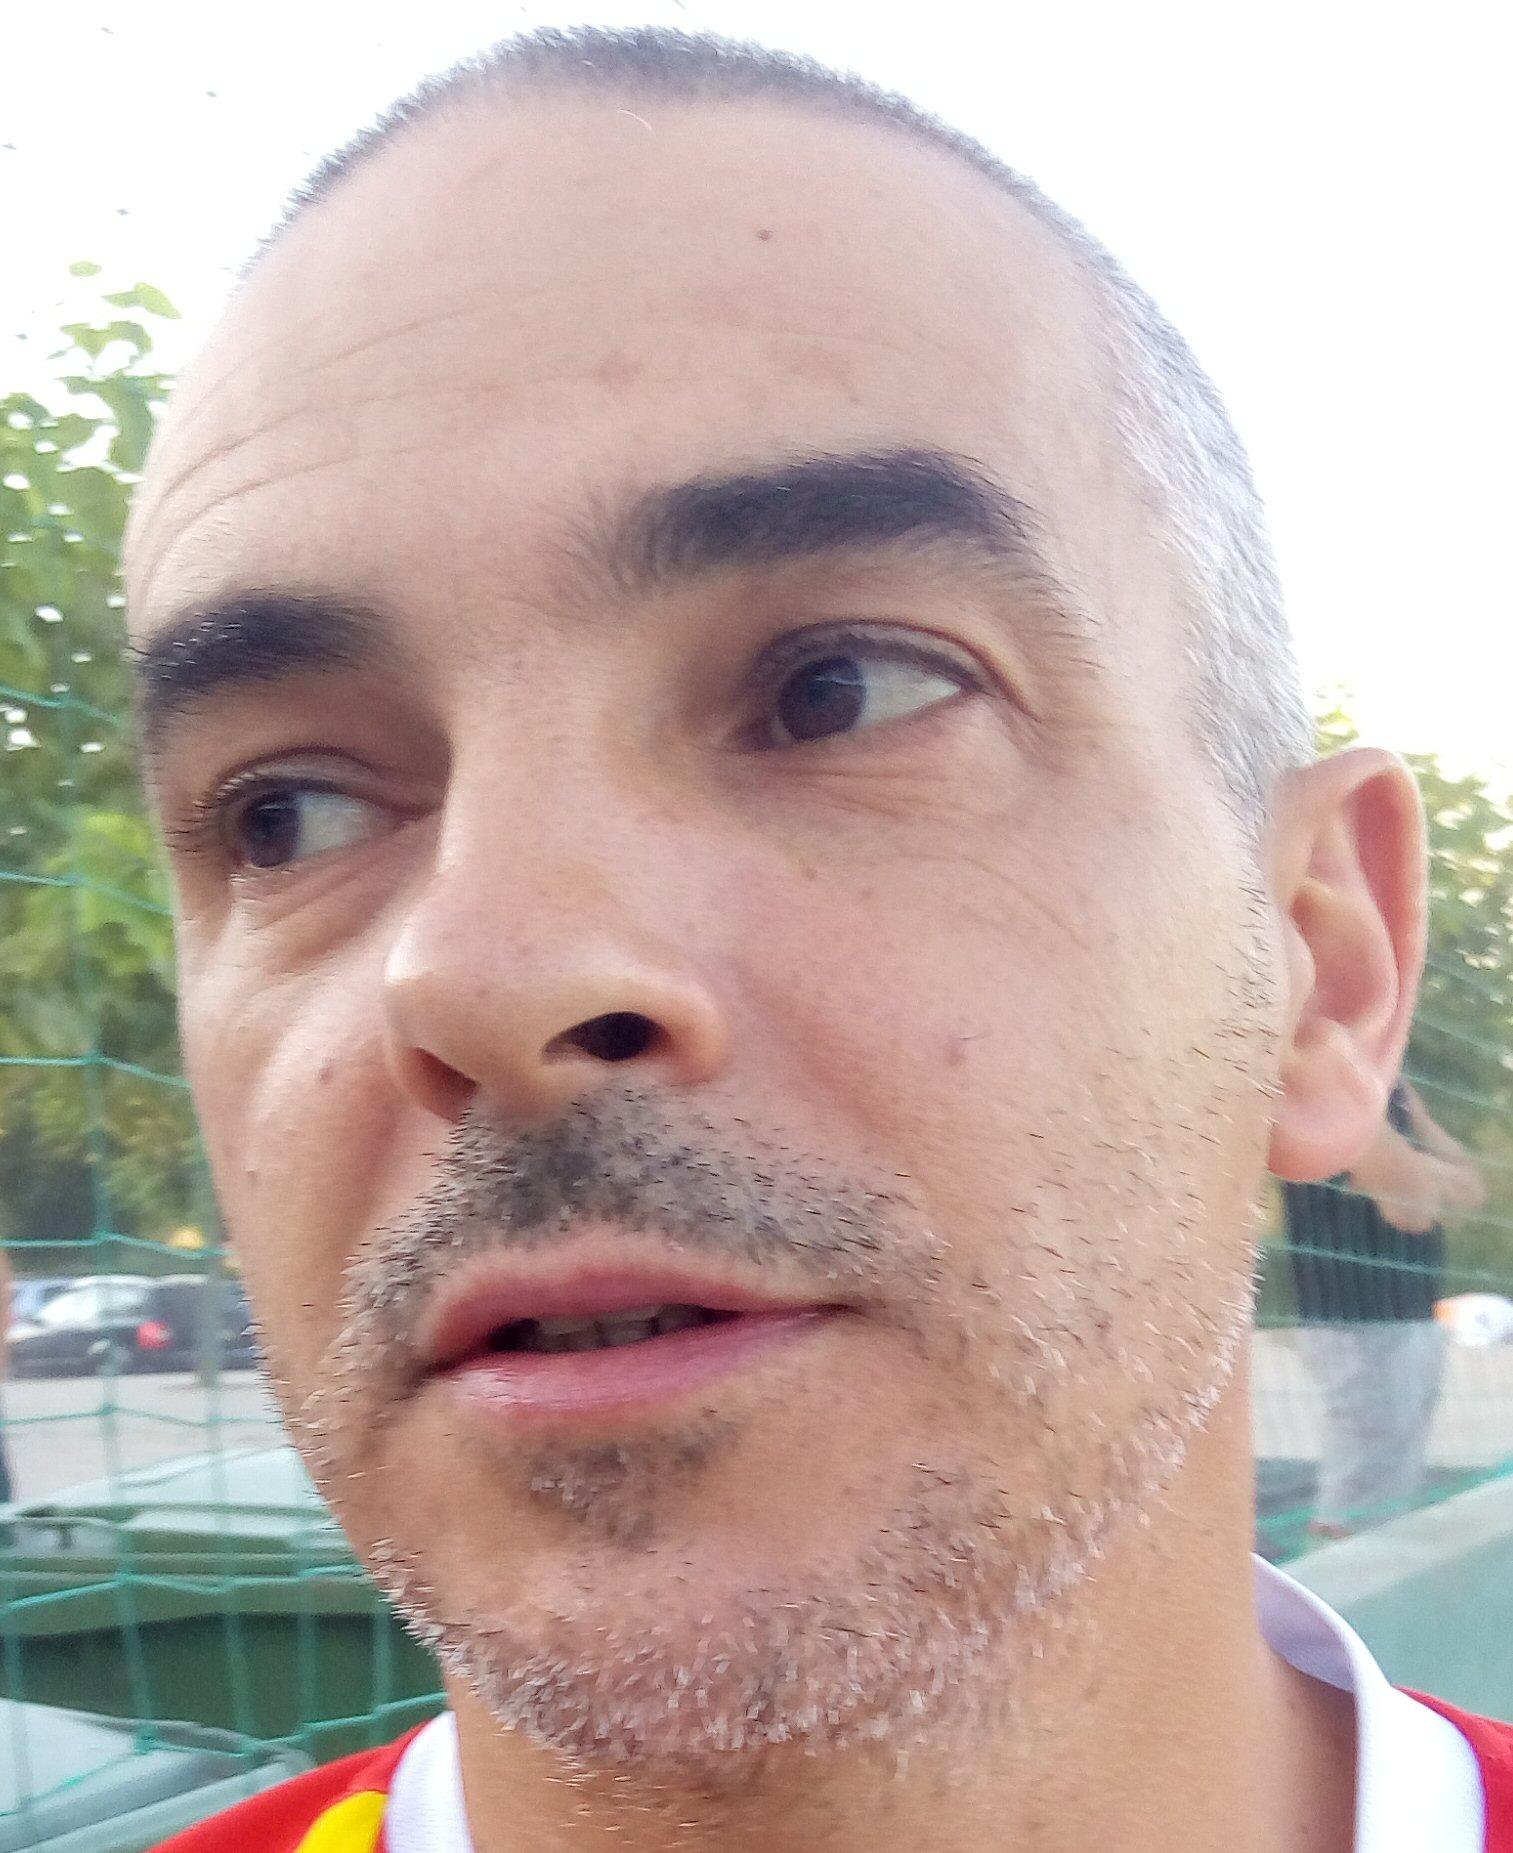 PAULO JORGE MOURA DE SOUSA